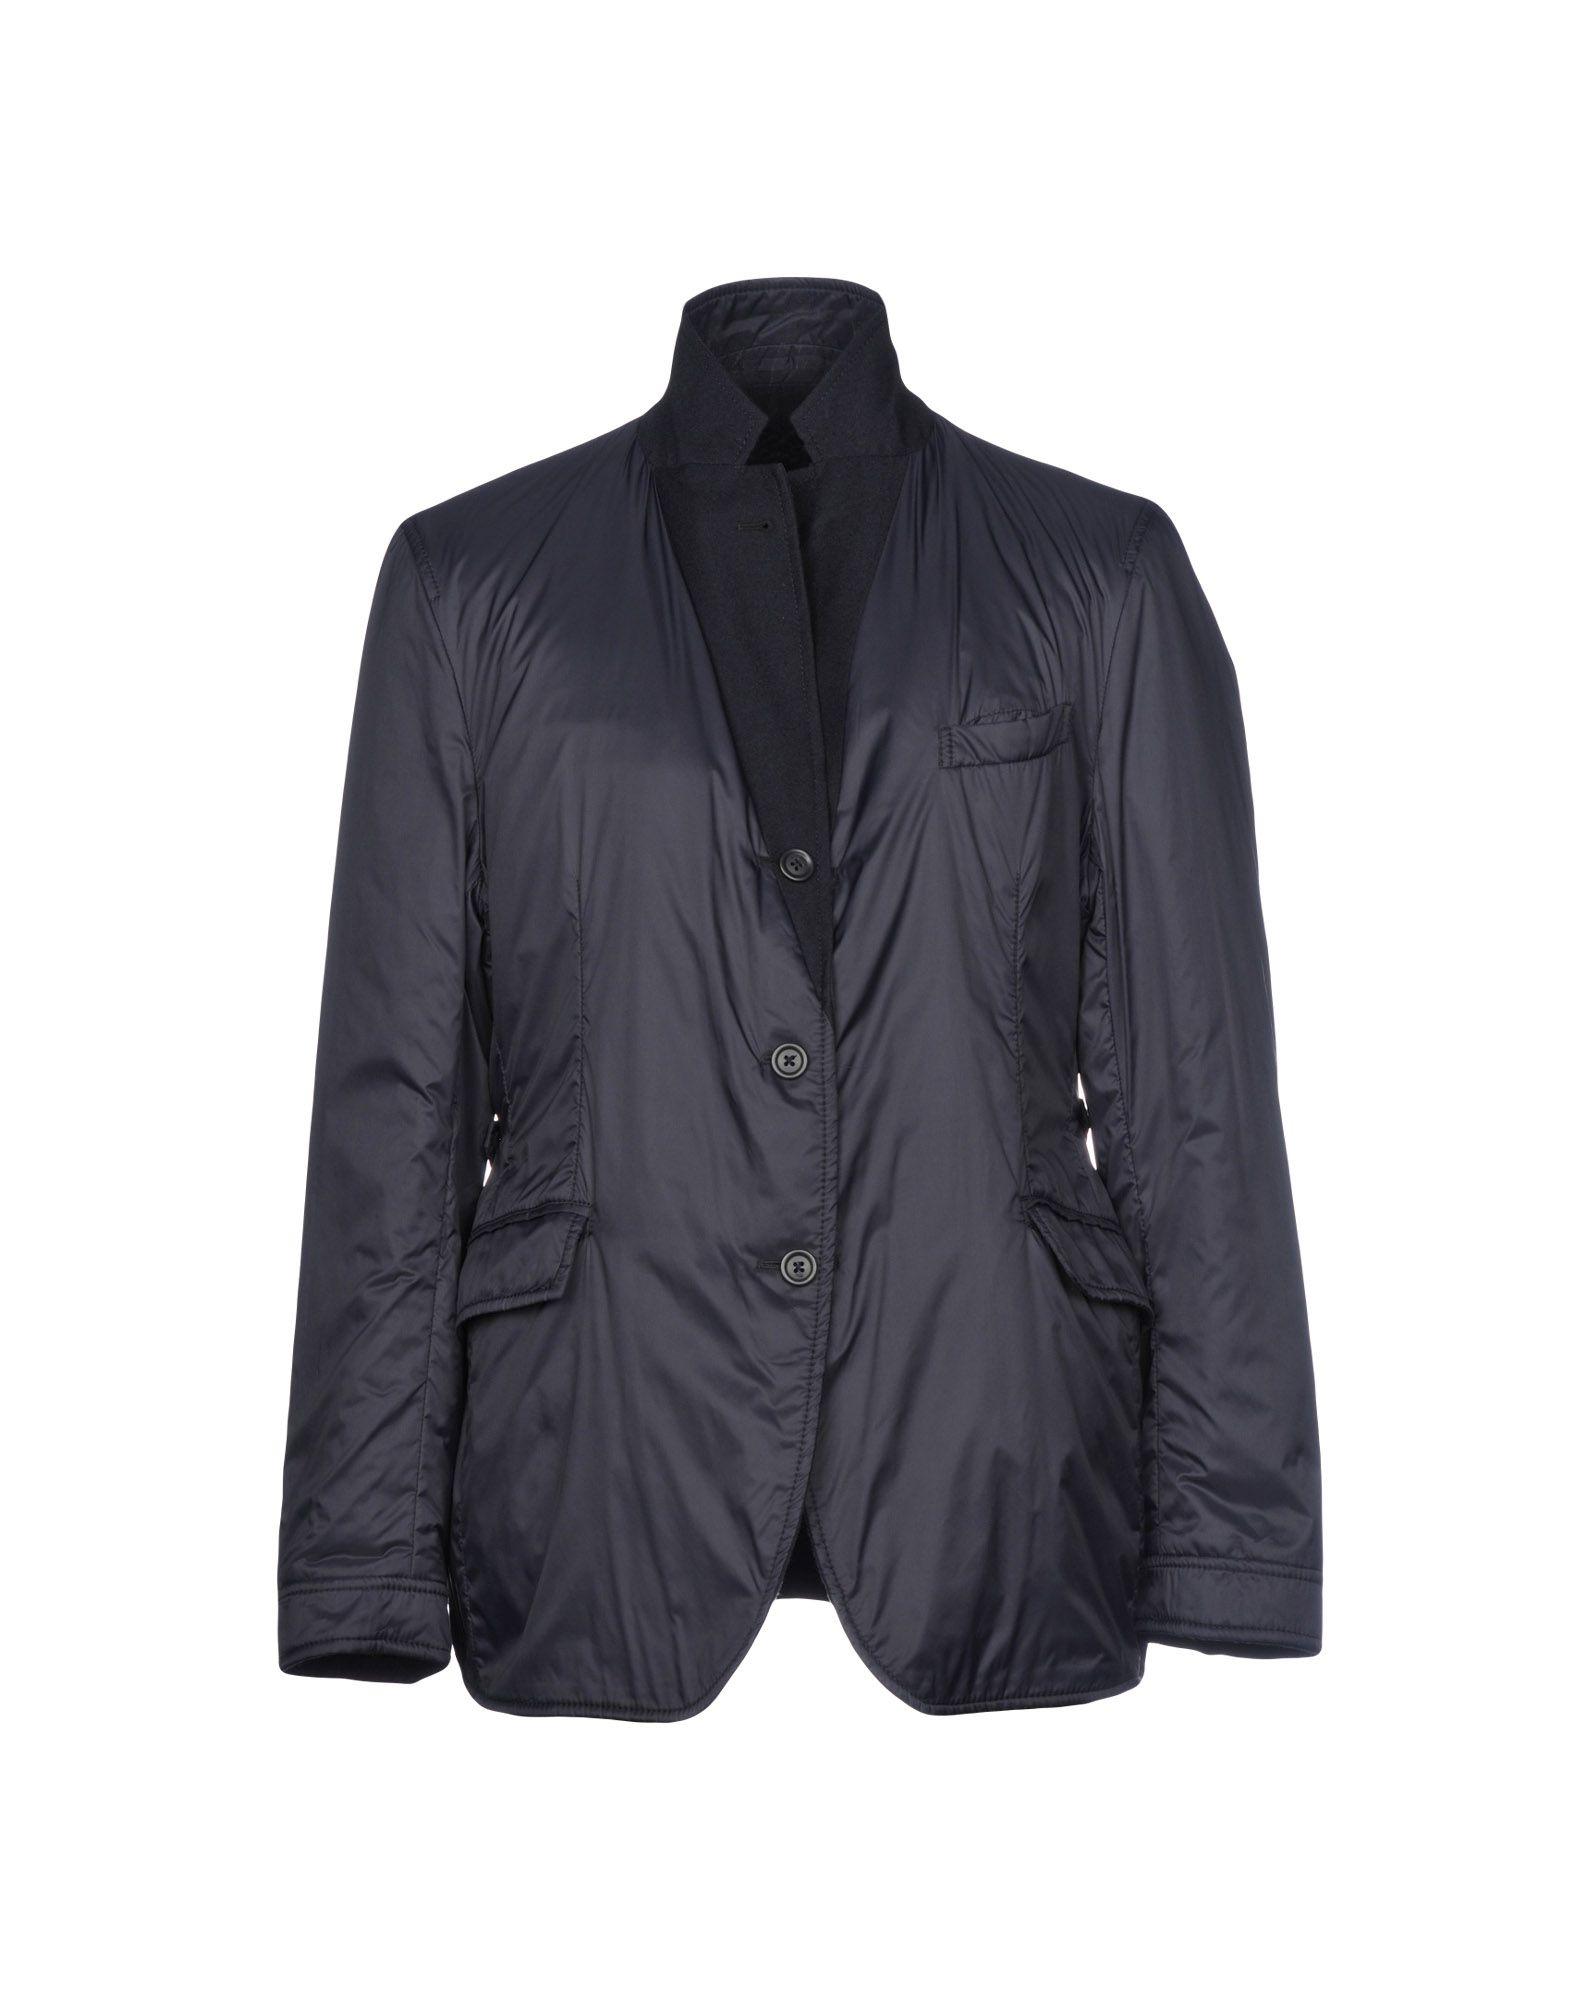 RVR LARDINI Blazer in Dark Blue